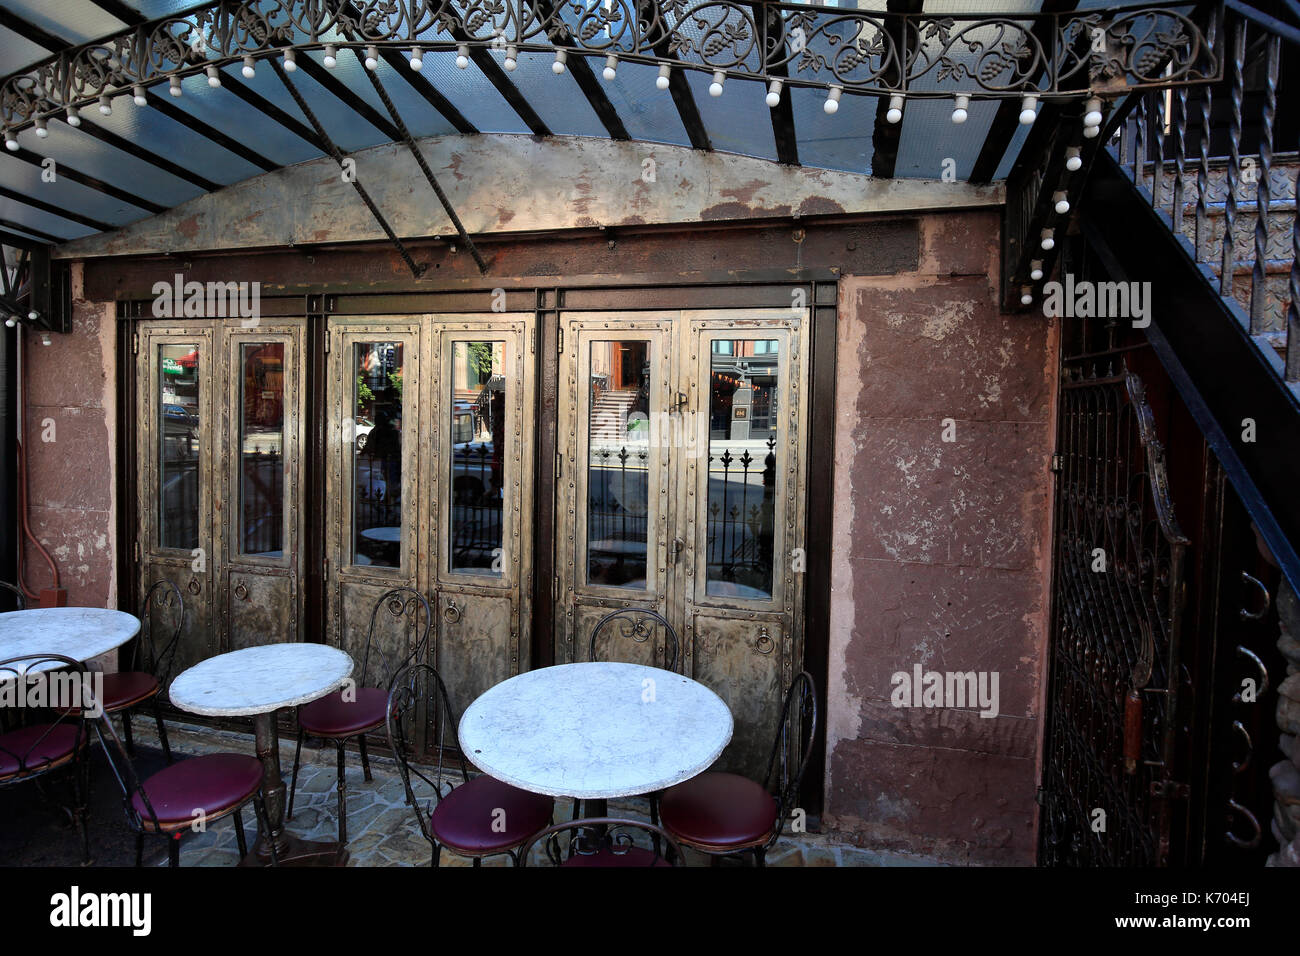 Empty sidewalk cafe in New York City - Stock Image